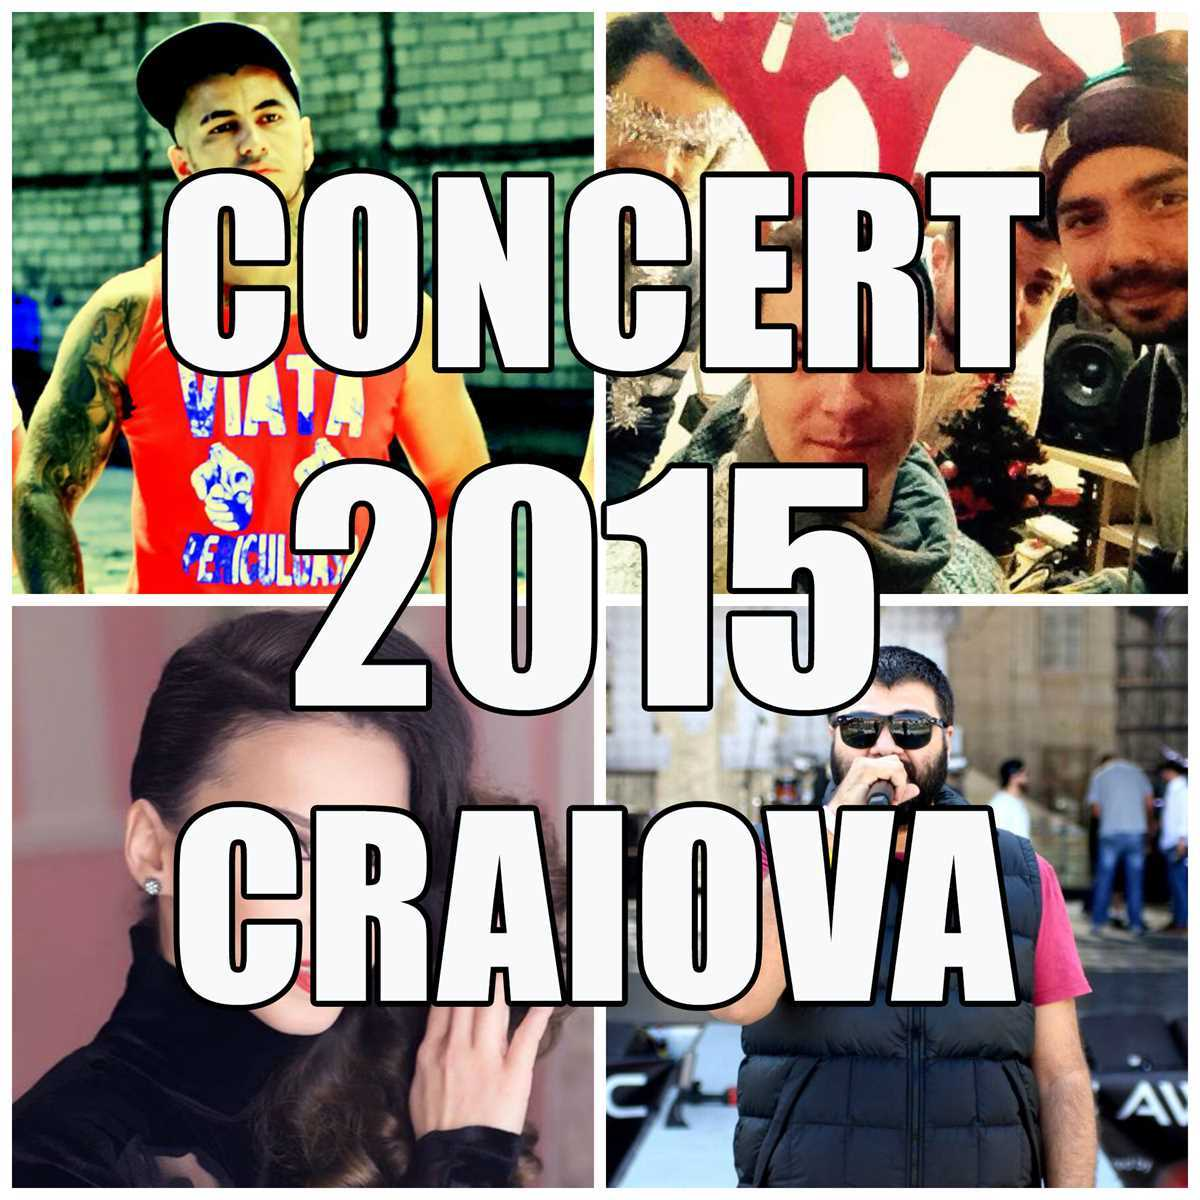 Concert Anul Nou 2015 Craiova